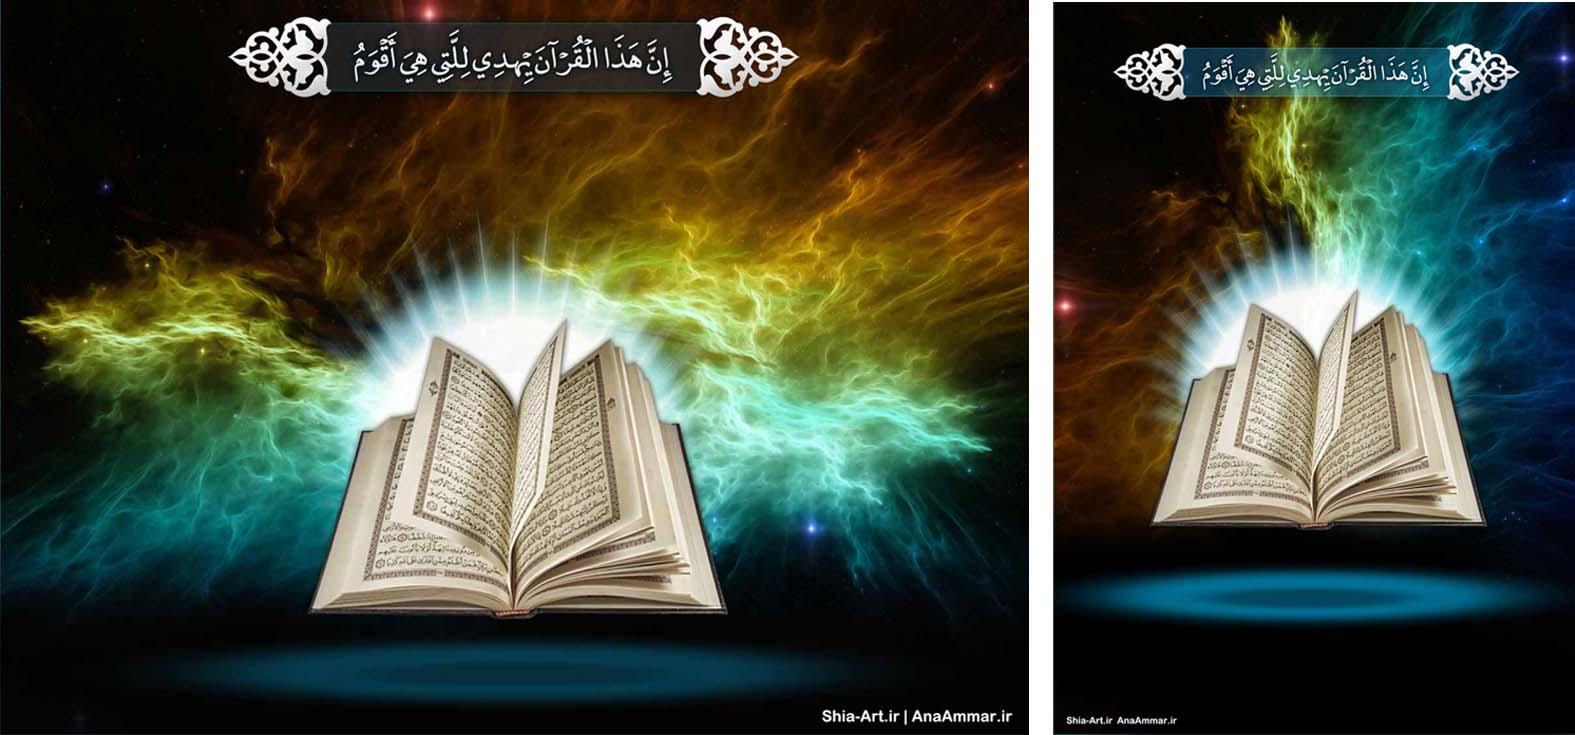 بنر و پوستر محافل قرآنی - قسمت سوم